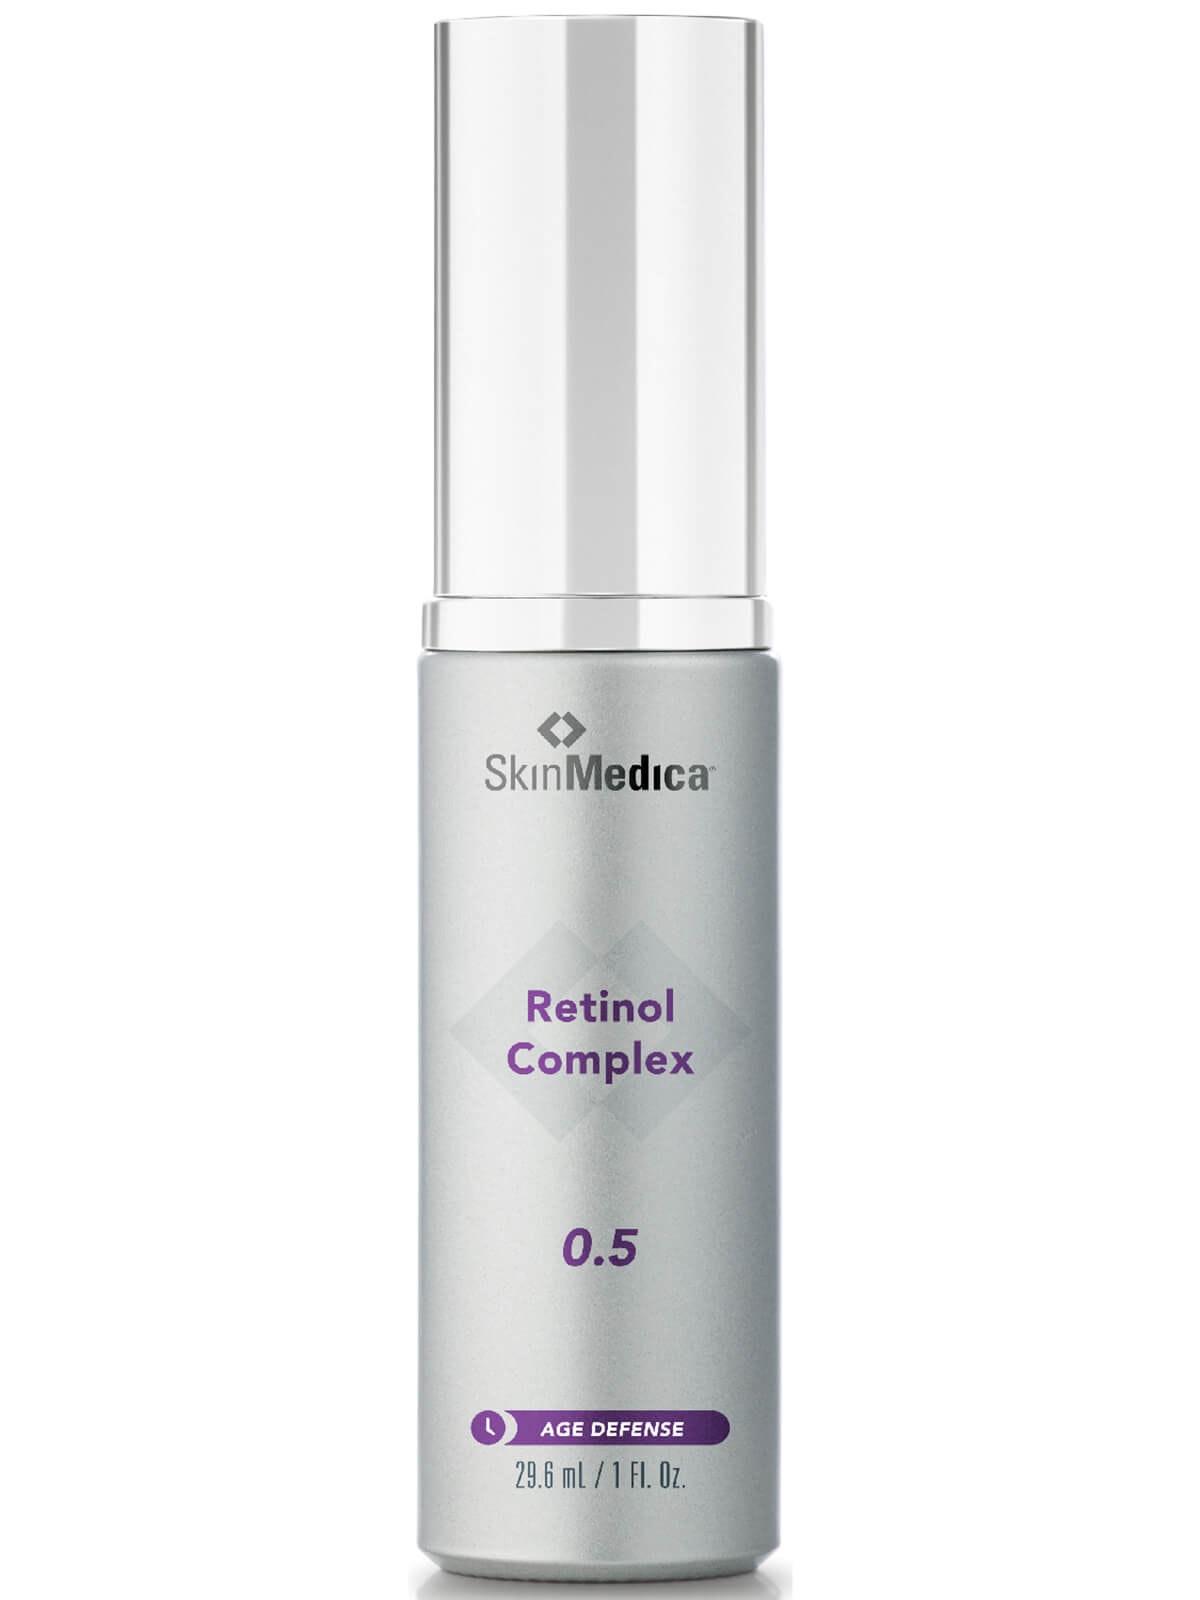 Skinmedica retinol